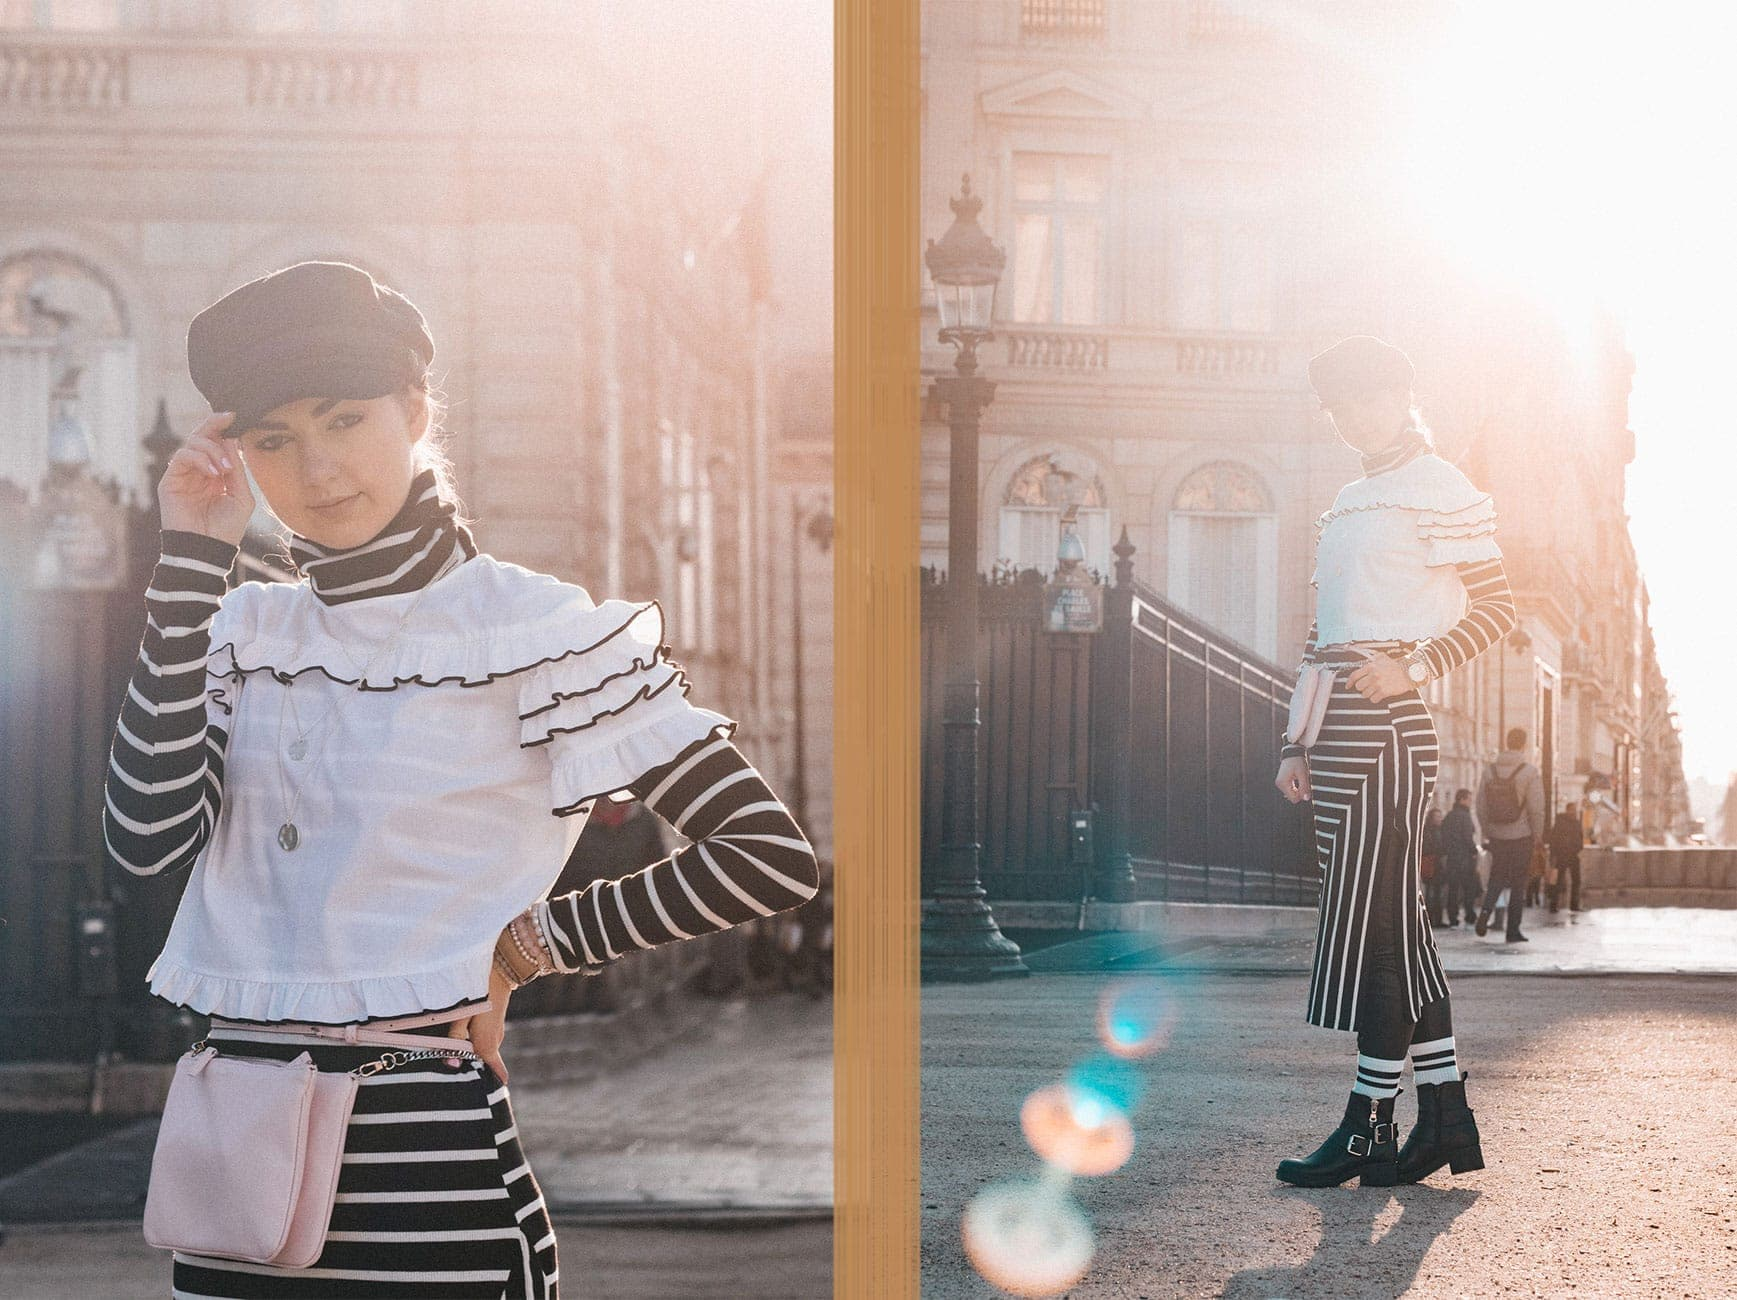 Paris, Paris Fashion Week, PFW, PFW18, Stripes, Basics, Outfit, Fashion, Fashion Blog, Fashion Blogger, Online-Magazine, Black and White, Ankle Boots, Details